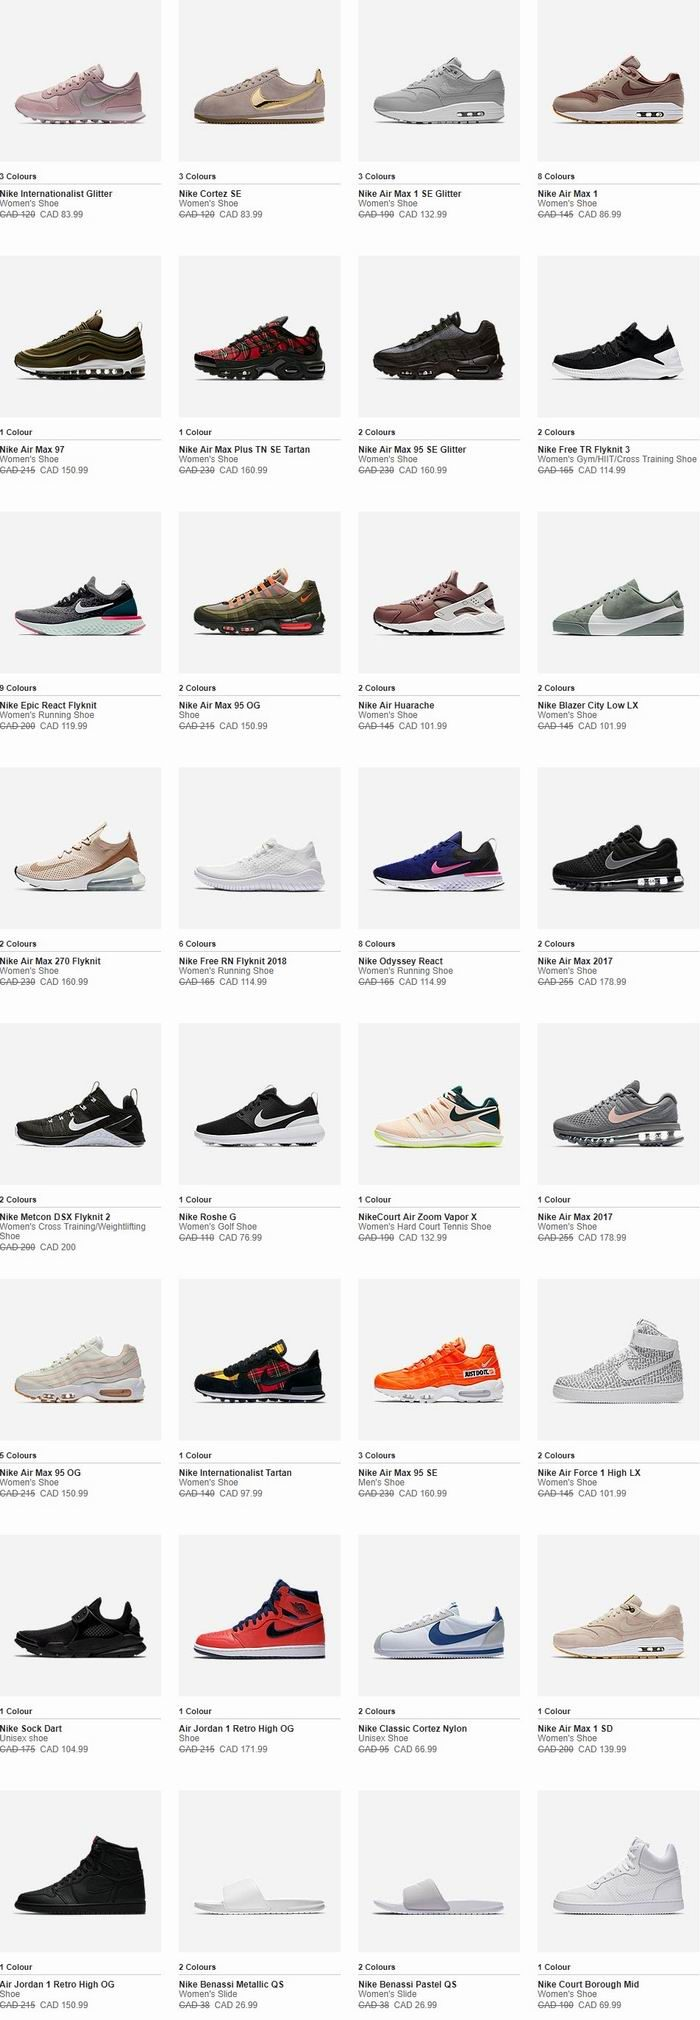 Nike黑五大促!精选上千款时尚运动鞋、运动服6折起+额外7折!收Air Max系列、Epic React Flyknit系列!